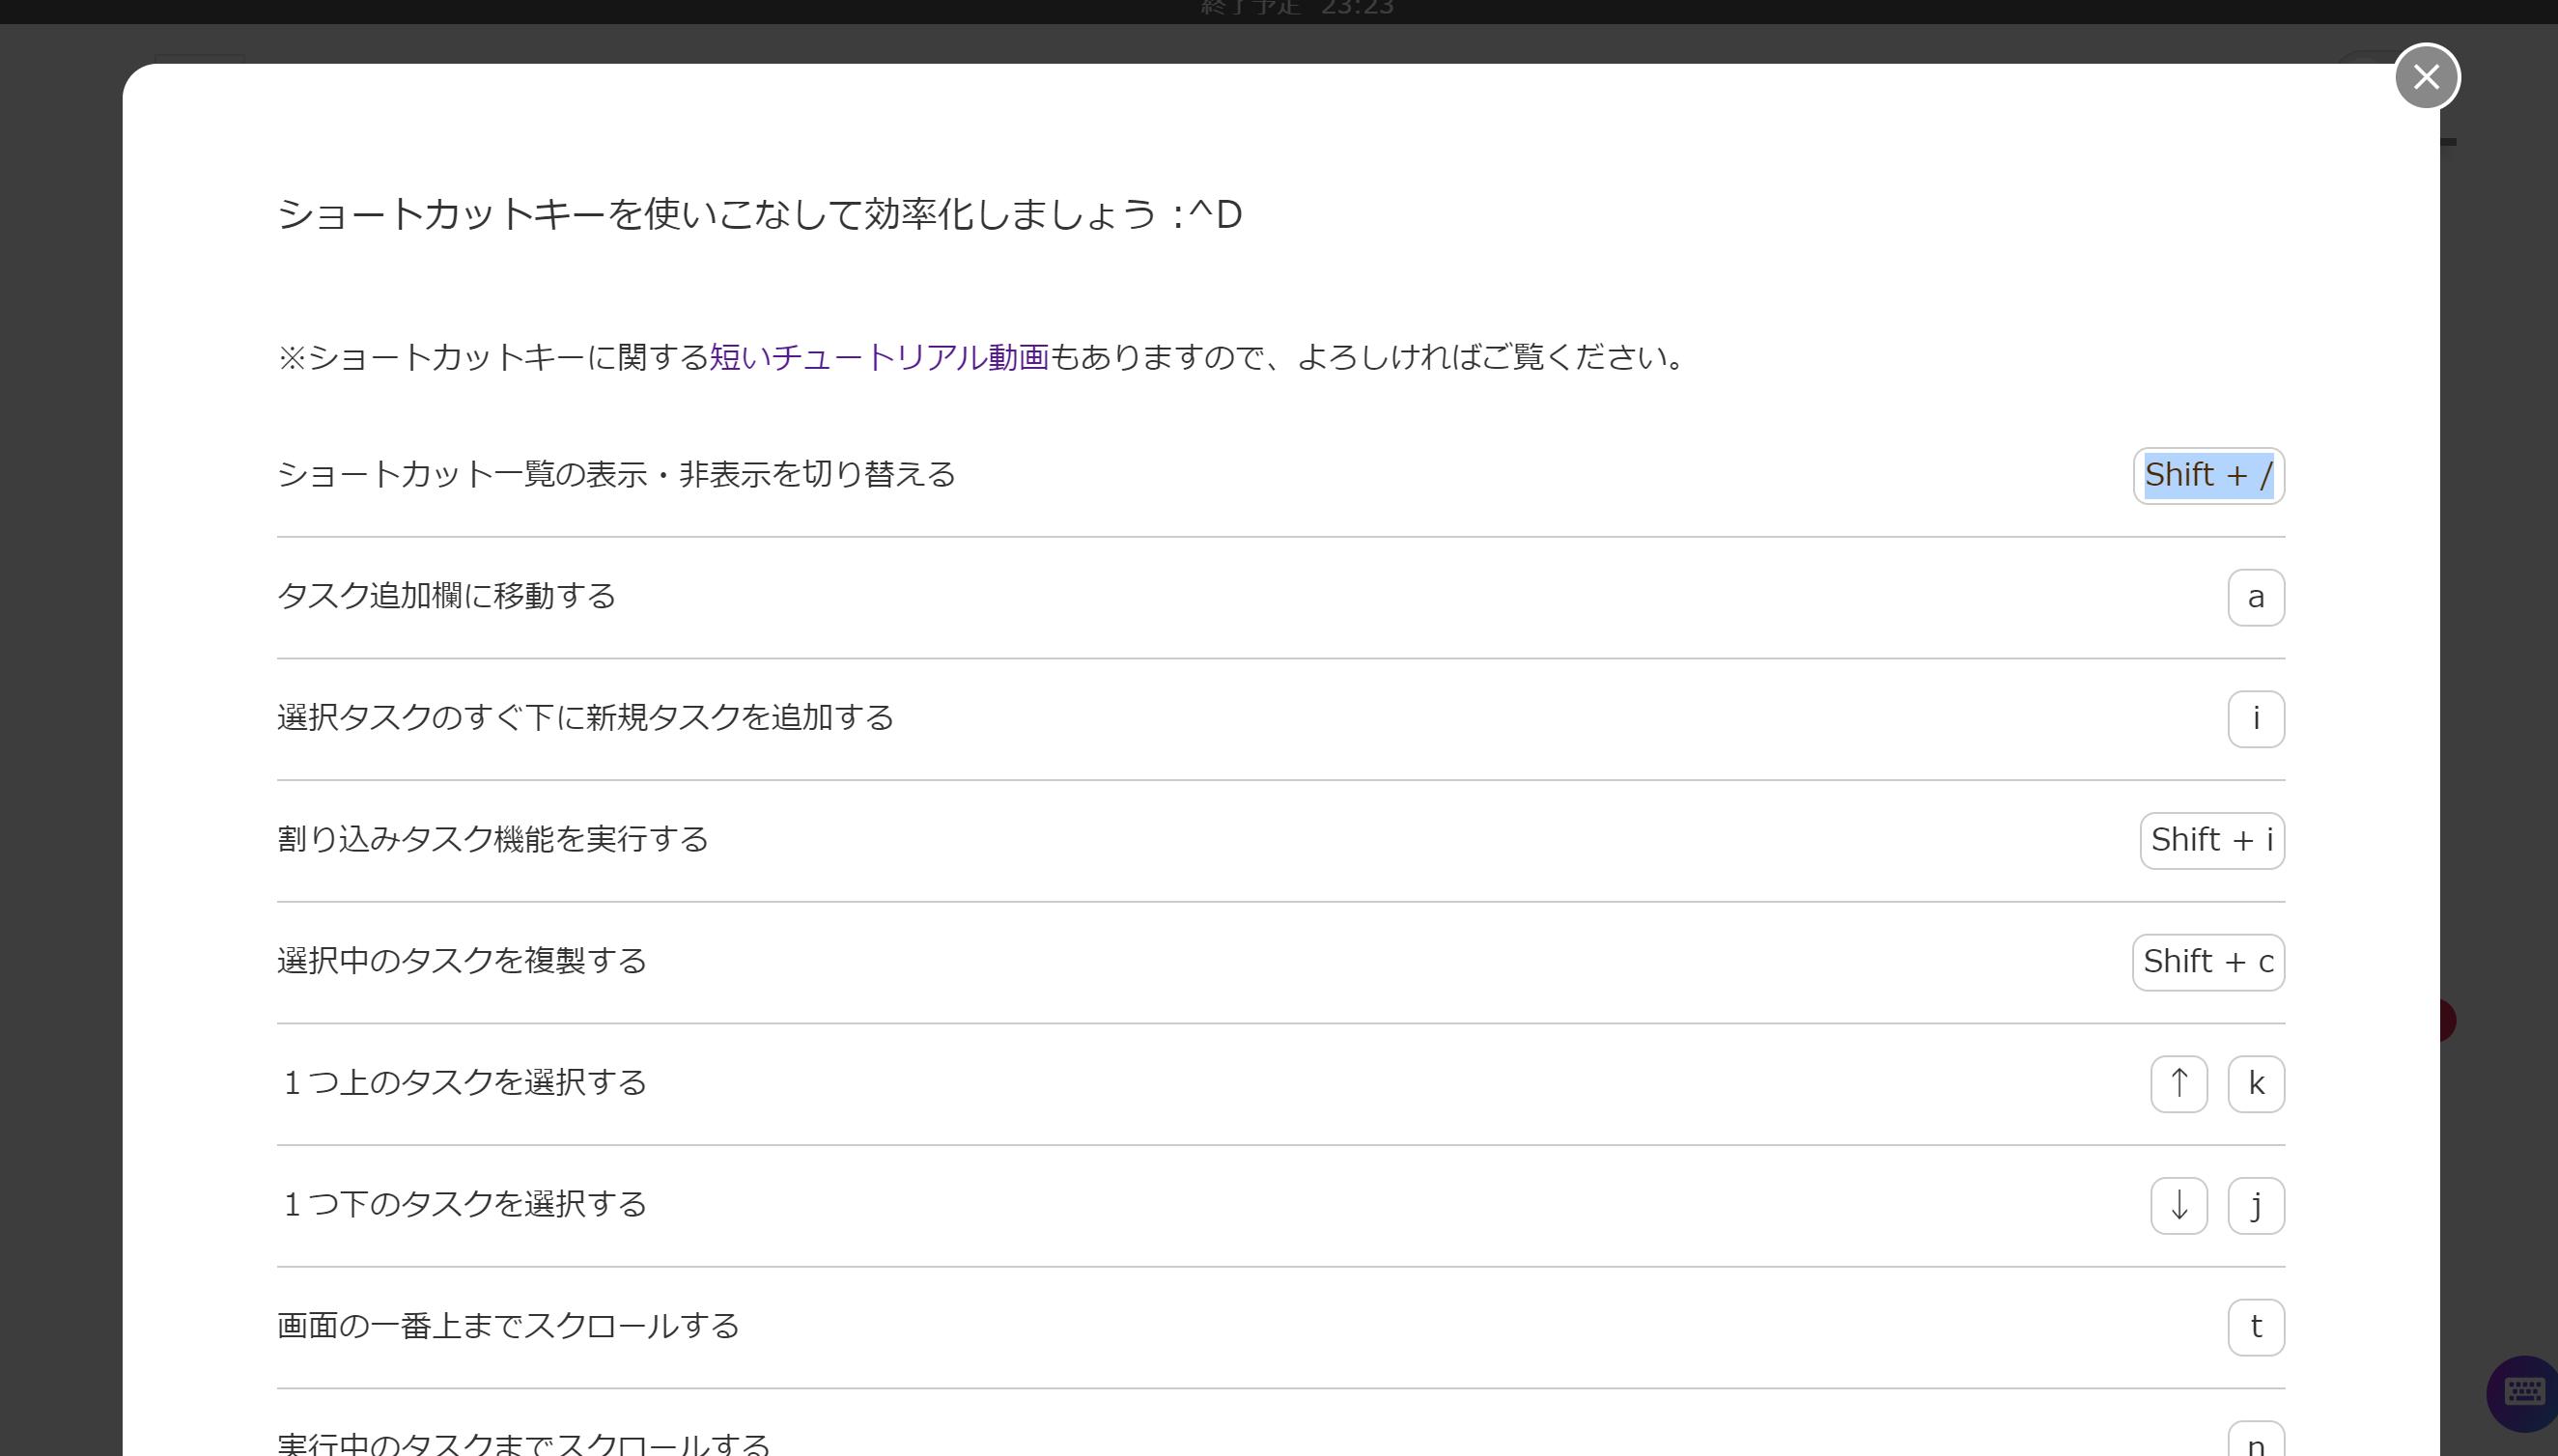 TaskChuteCloud_shortcut_button1